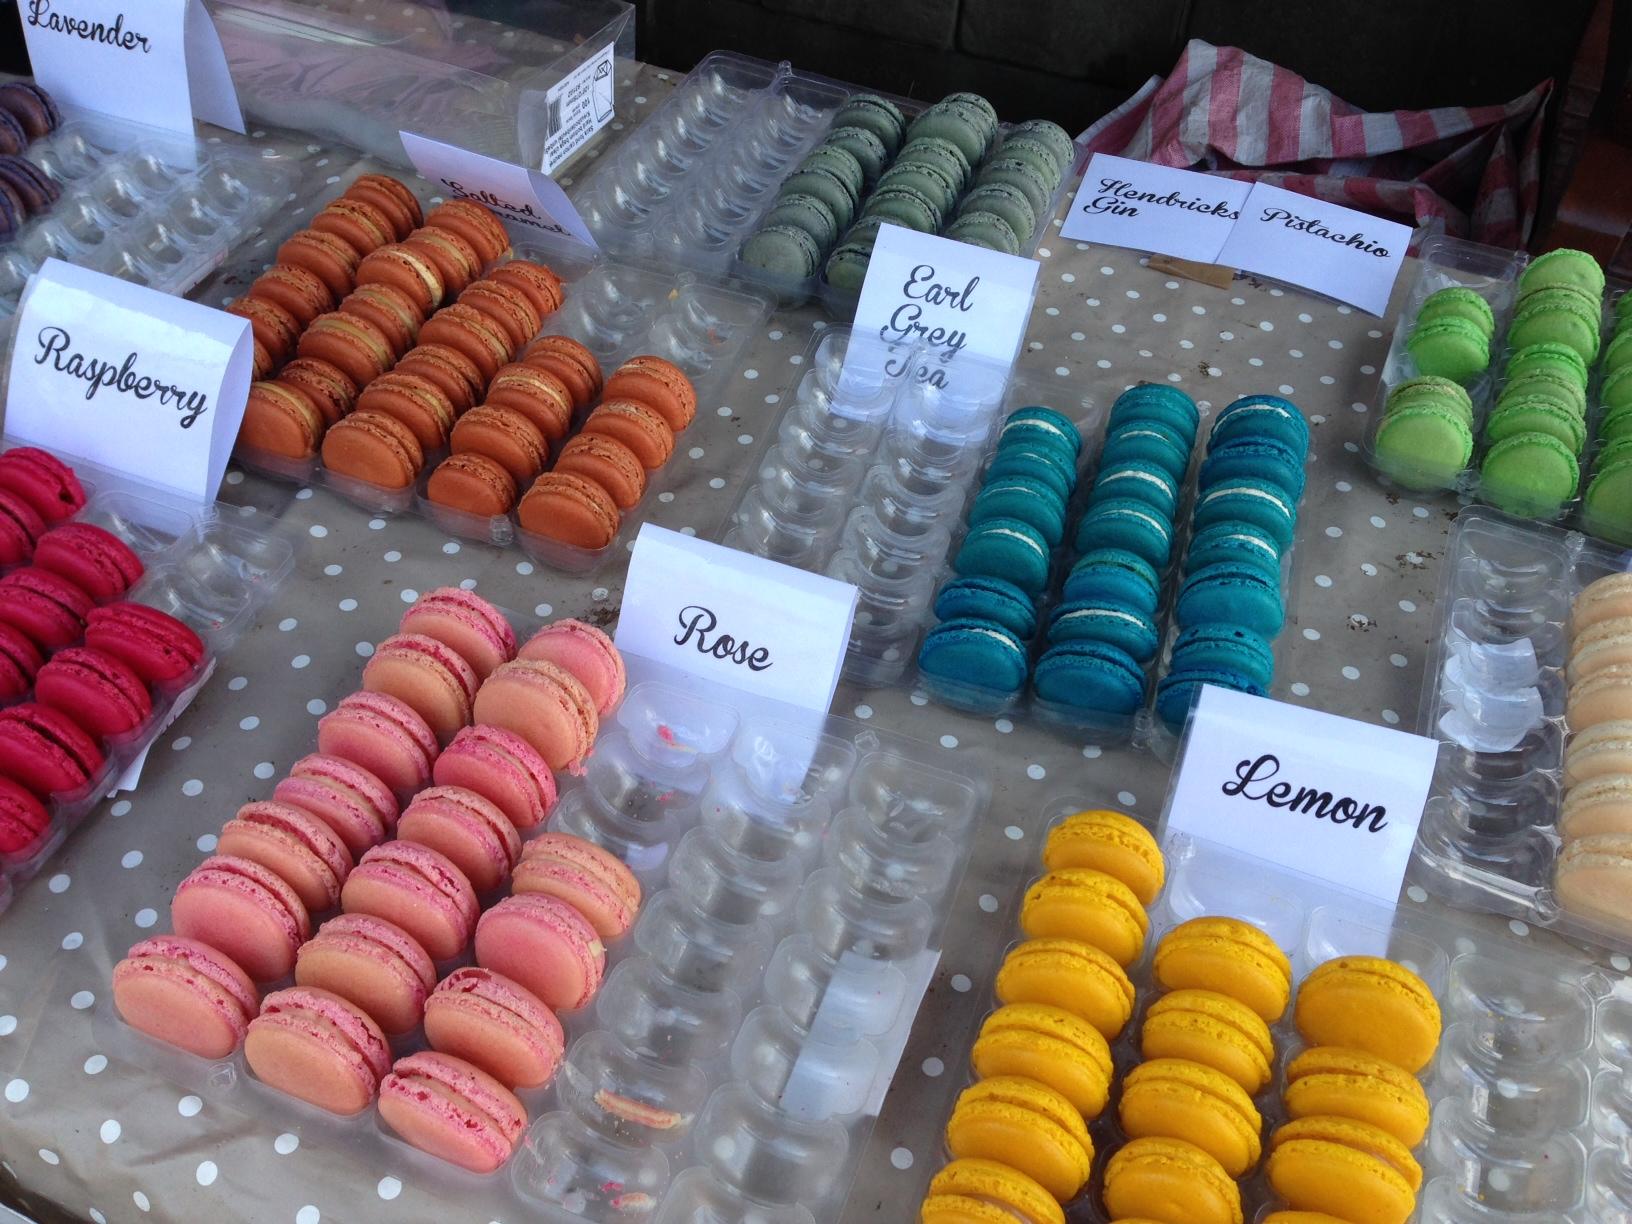 Macaron display at the stall of Mademoiselle Macaron